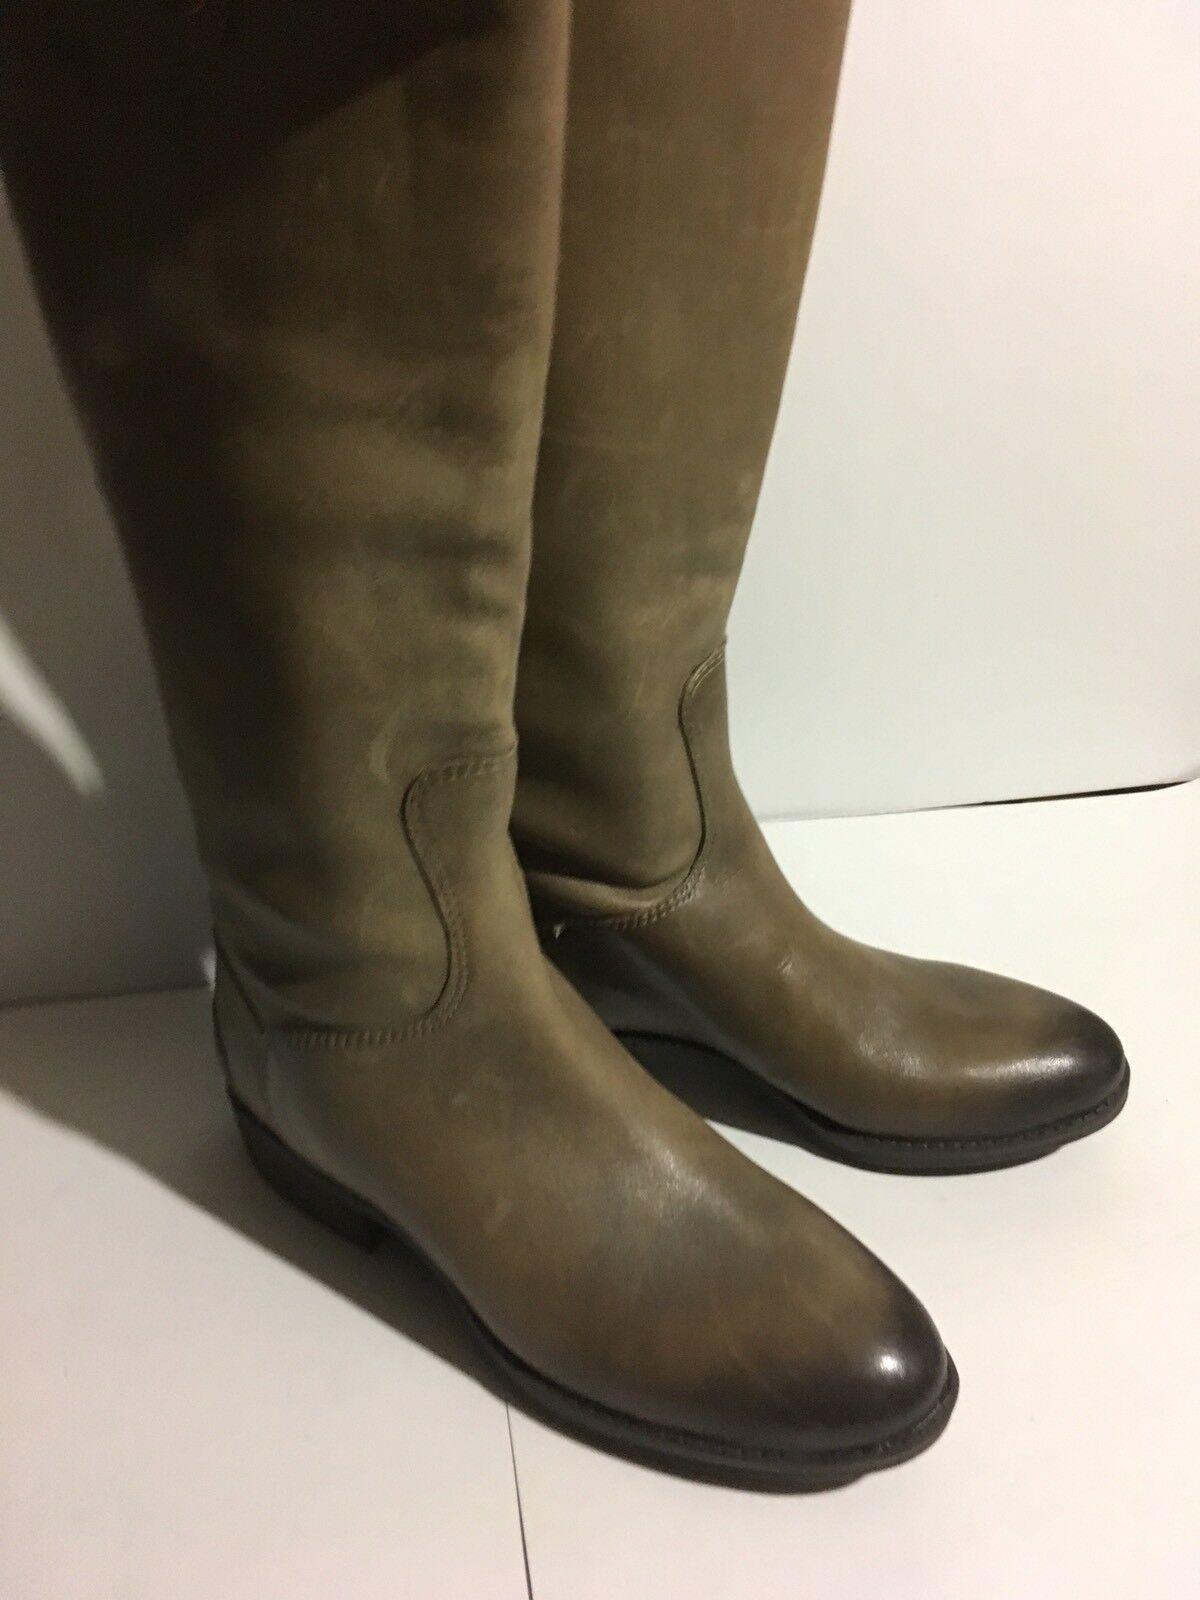 Sam Edelman Penny läder Knee höga stövlar kvinnor Storlek 4 M Olive